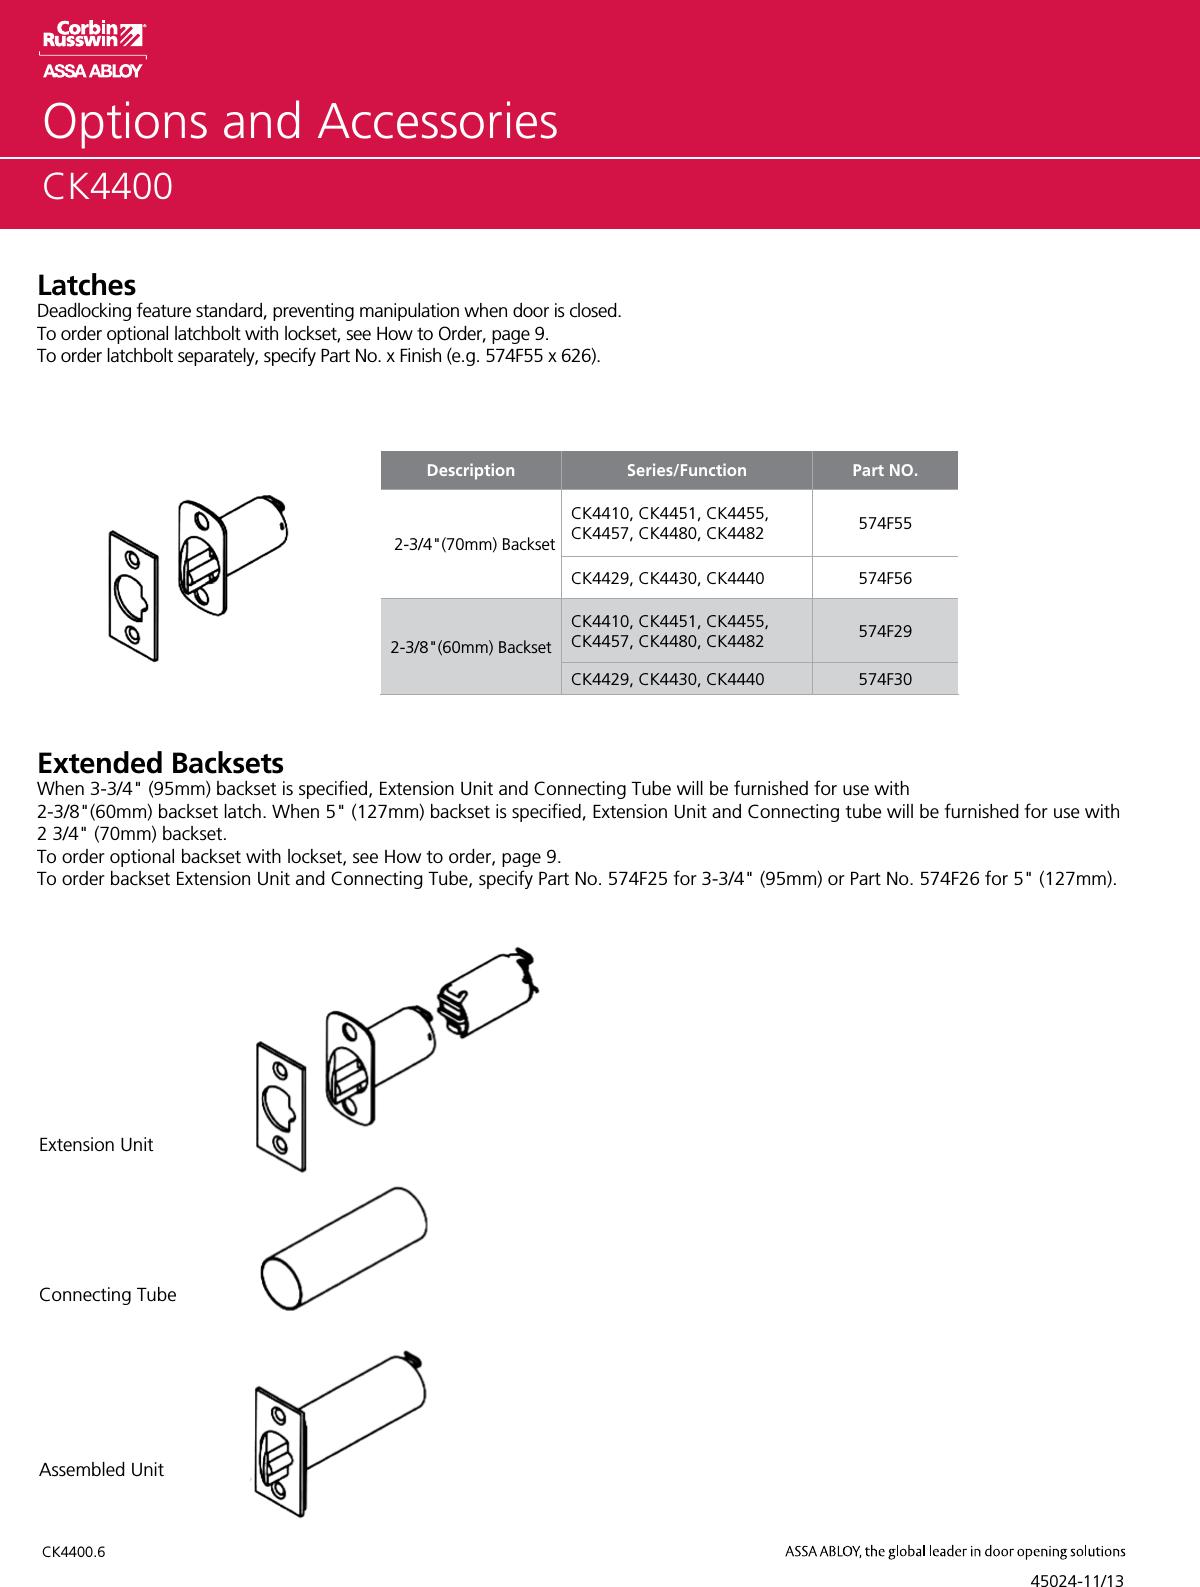 613 2-3//4 Backset Right Hand Reversible Steel//Bronze 2-3//4 Backset Corbin Russwin CK4455-GWC-613-KR Grade 2 Classroom Oil Rubbed Dark